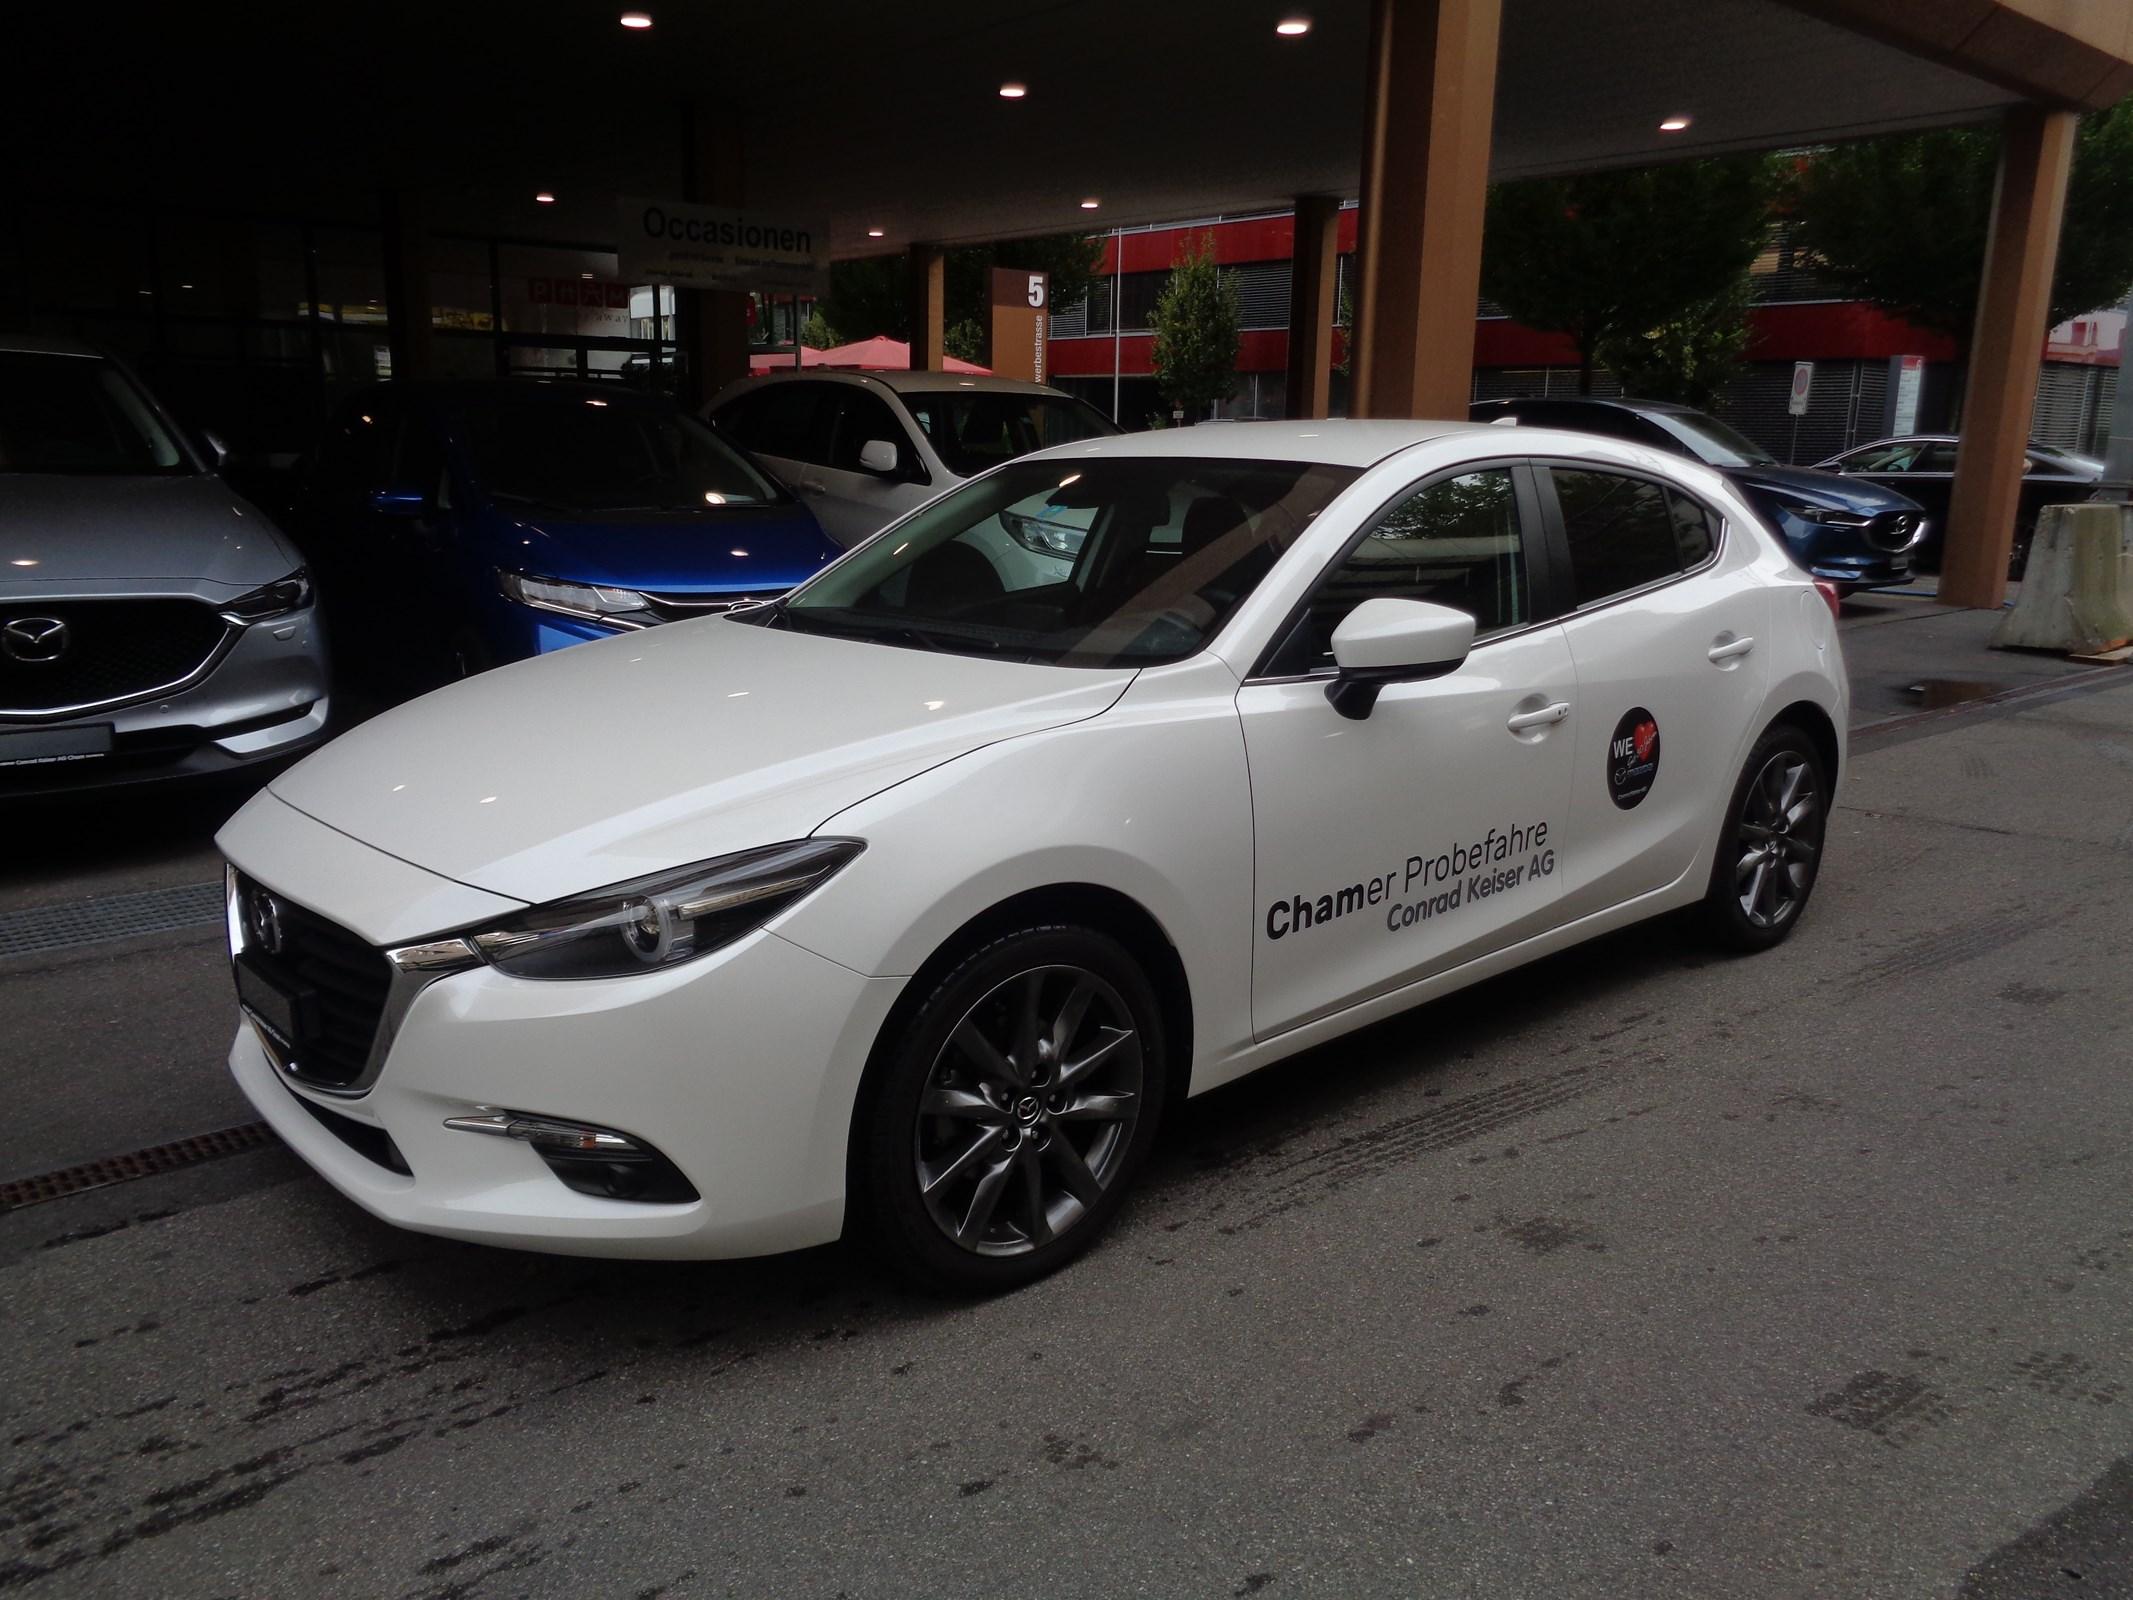 saloon Mazda 3 SKYACTIV-G 120 Ambition Plus